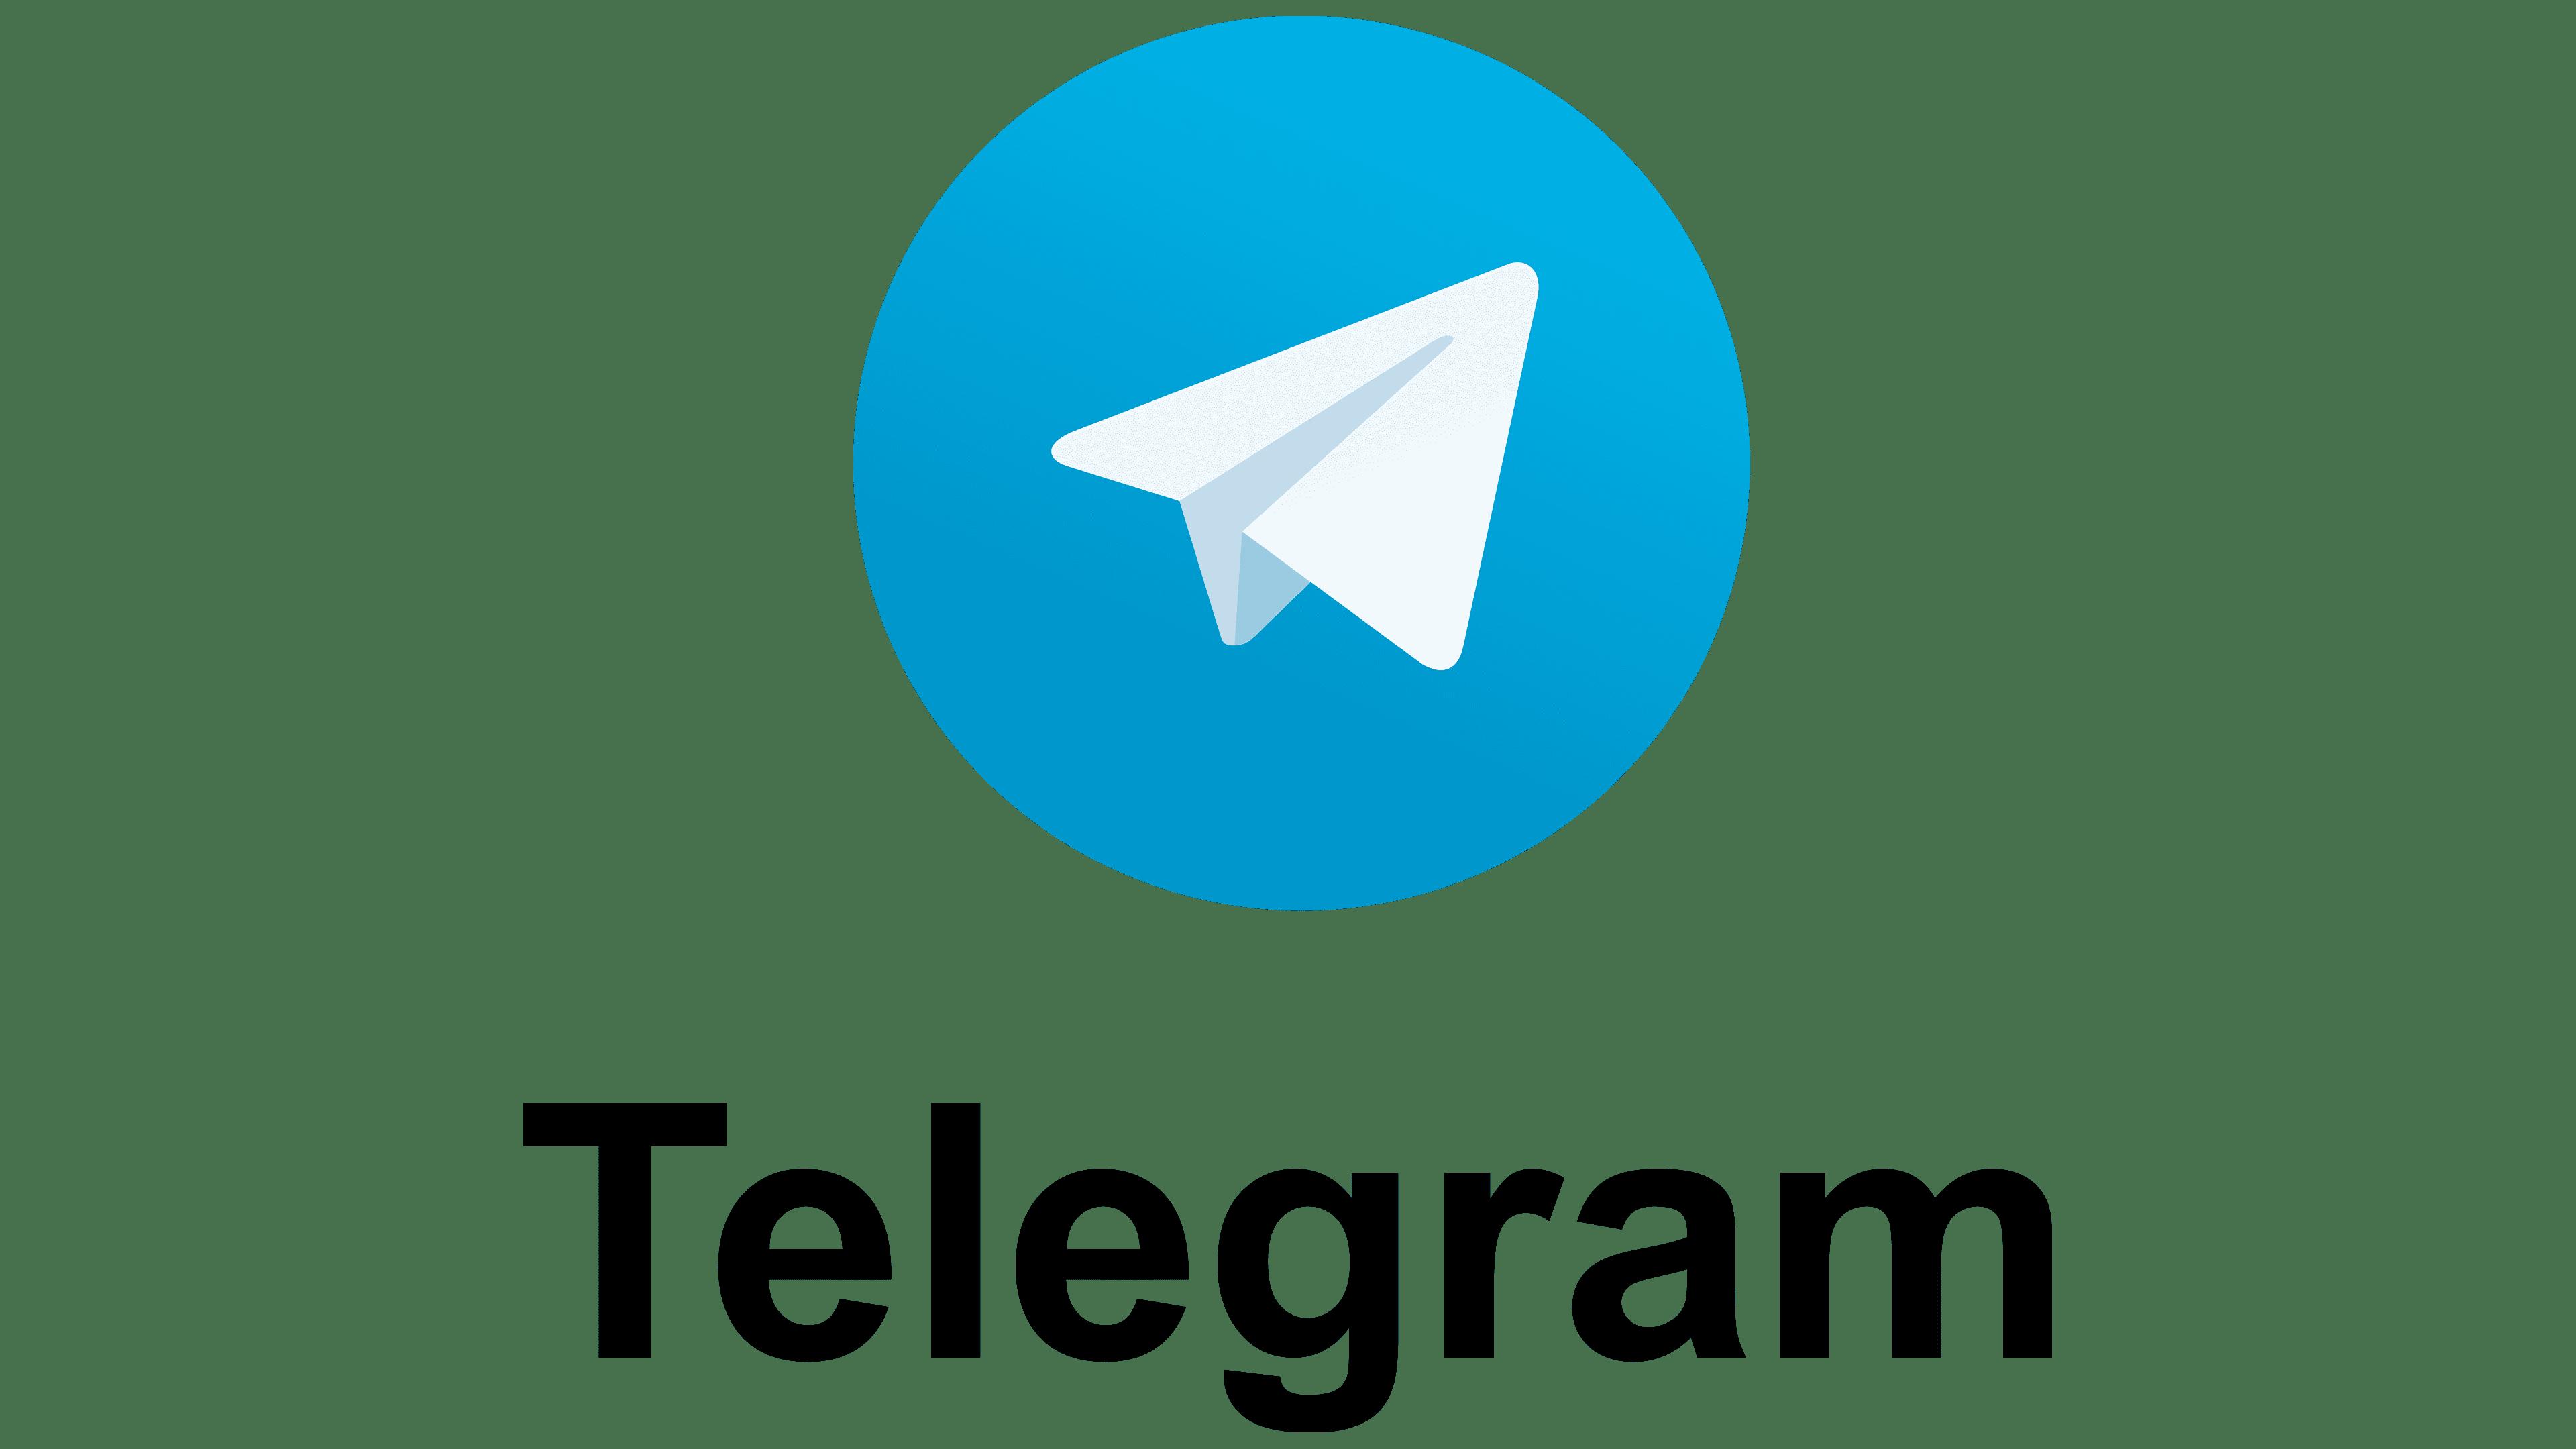 Telegram Logo Symbol History Png 3840 2160